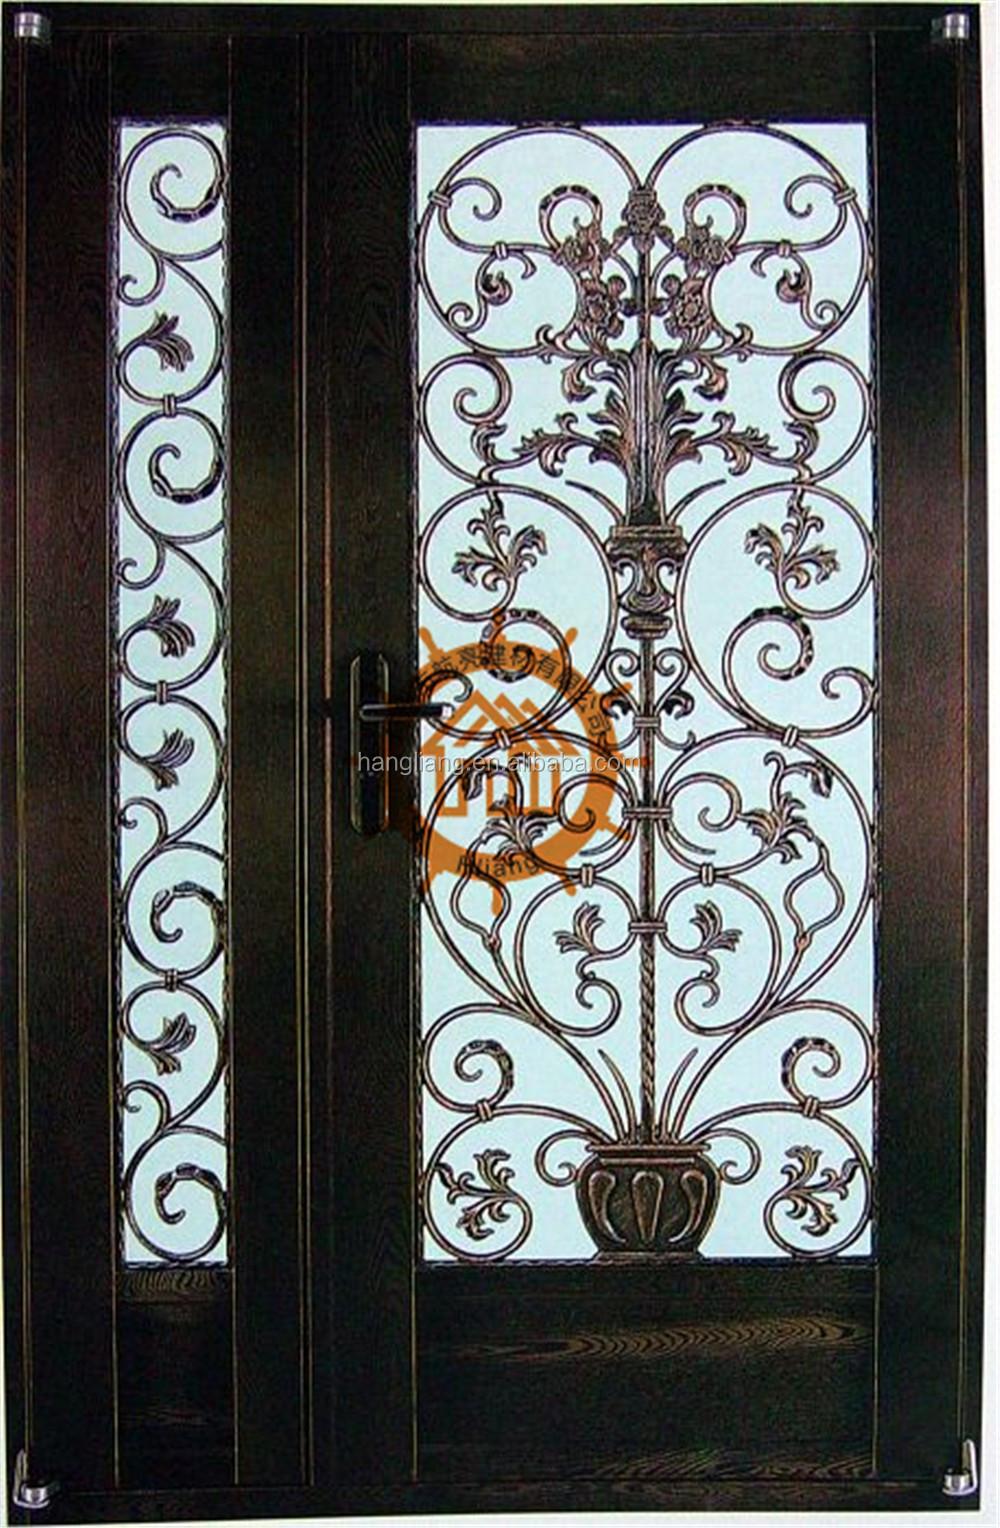 2017 double entr e en fer forg porte en verre tremp hl i d 136 portes id de produit for Porte entree fer forge verre